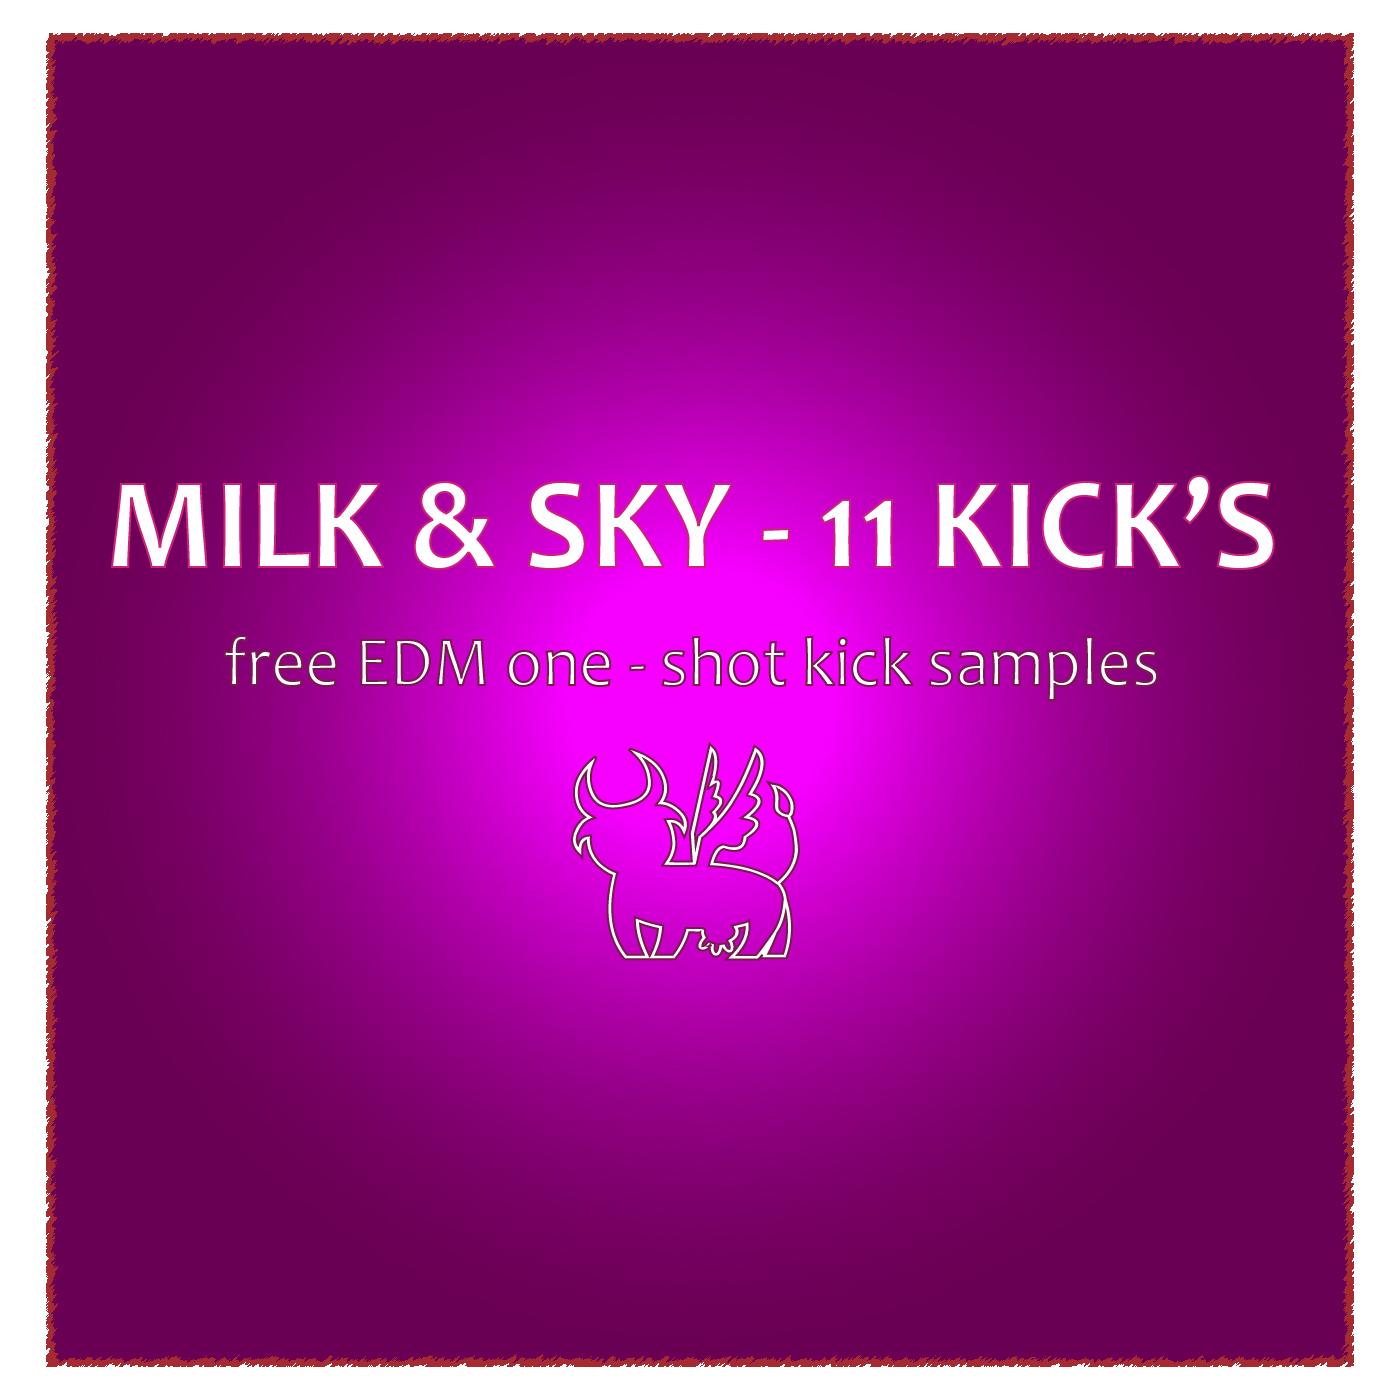 Milk & Sky - 11 Kicks (Free EDM One - Shot Kick Samples) by